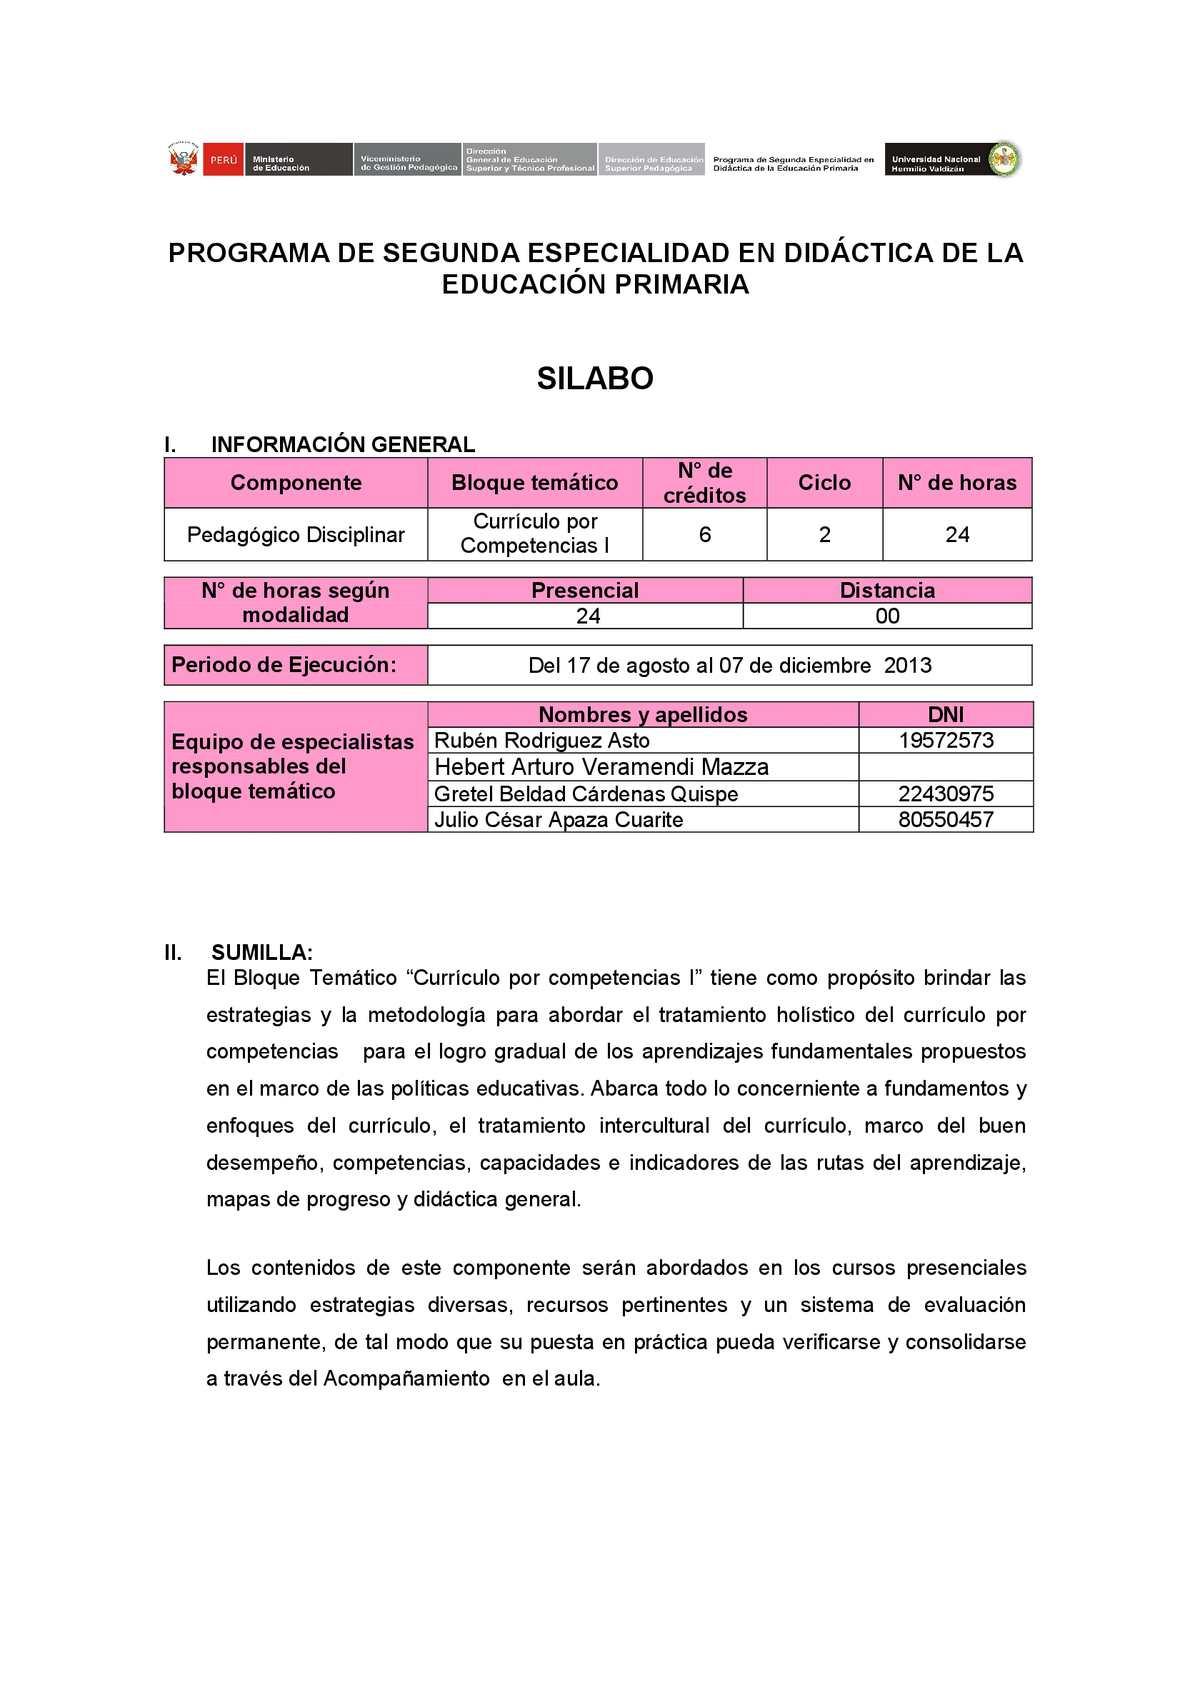 Calaméo - SILABO BLOQUE TEMÁTICO CURRÍCULO POR COMPETENCIAS